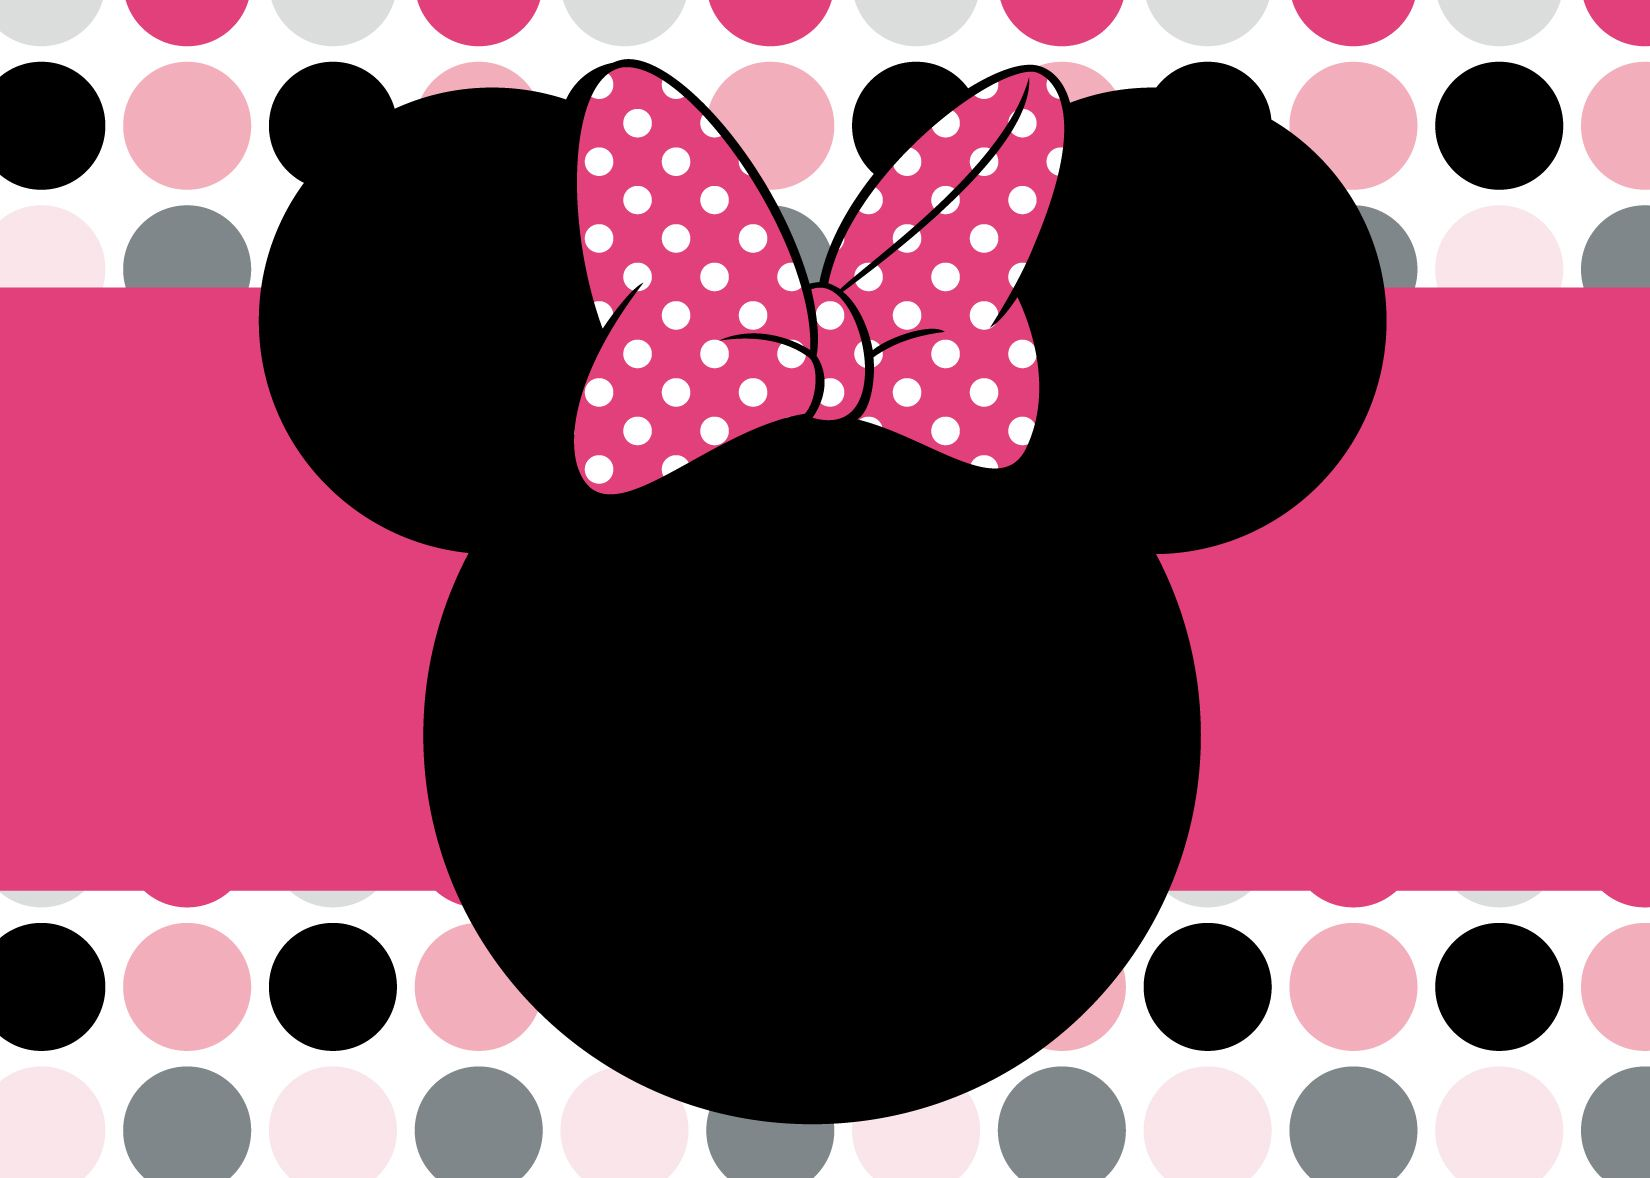 Frases de invitaciones de cumplea os para poner de fondo 2 - Cumpleanos minnie mouse ...